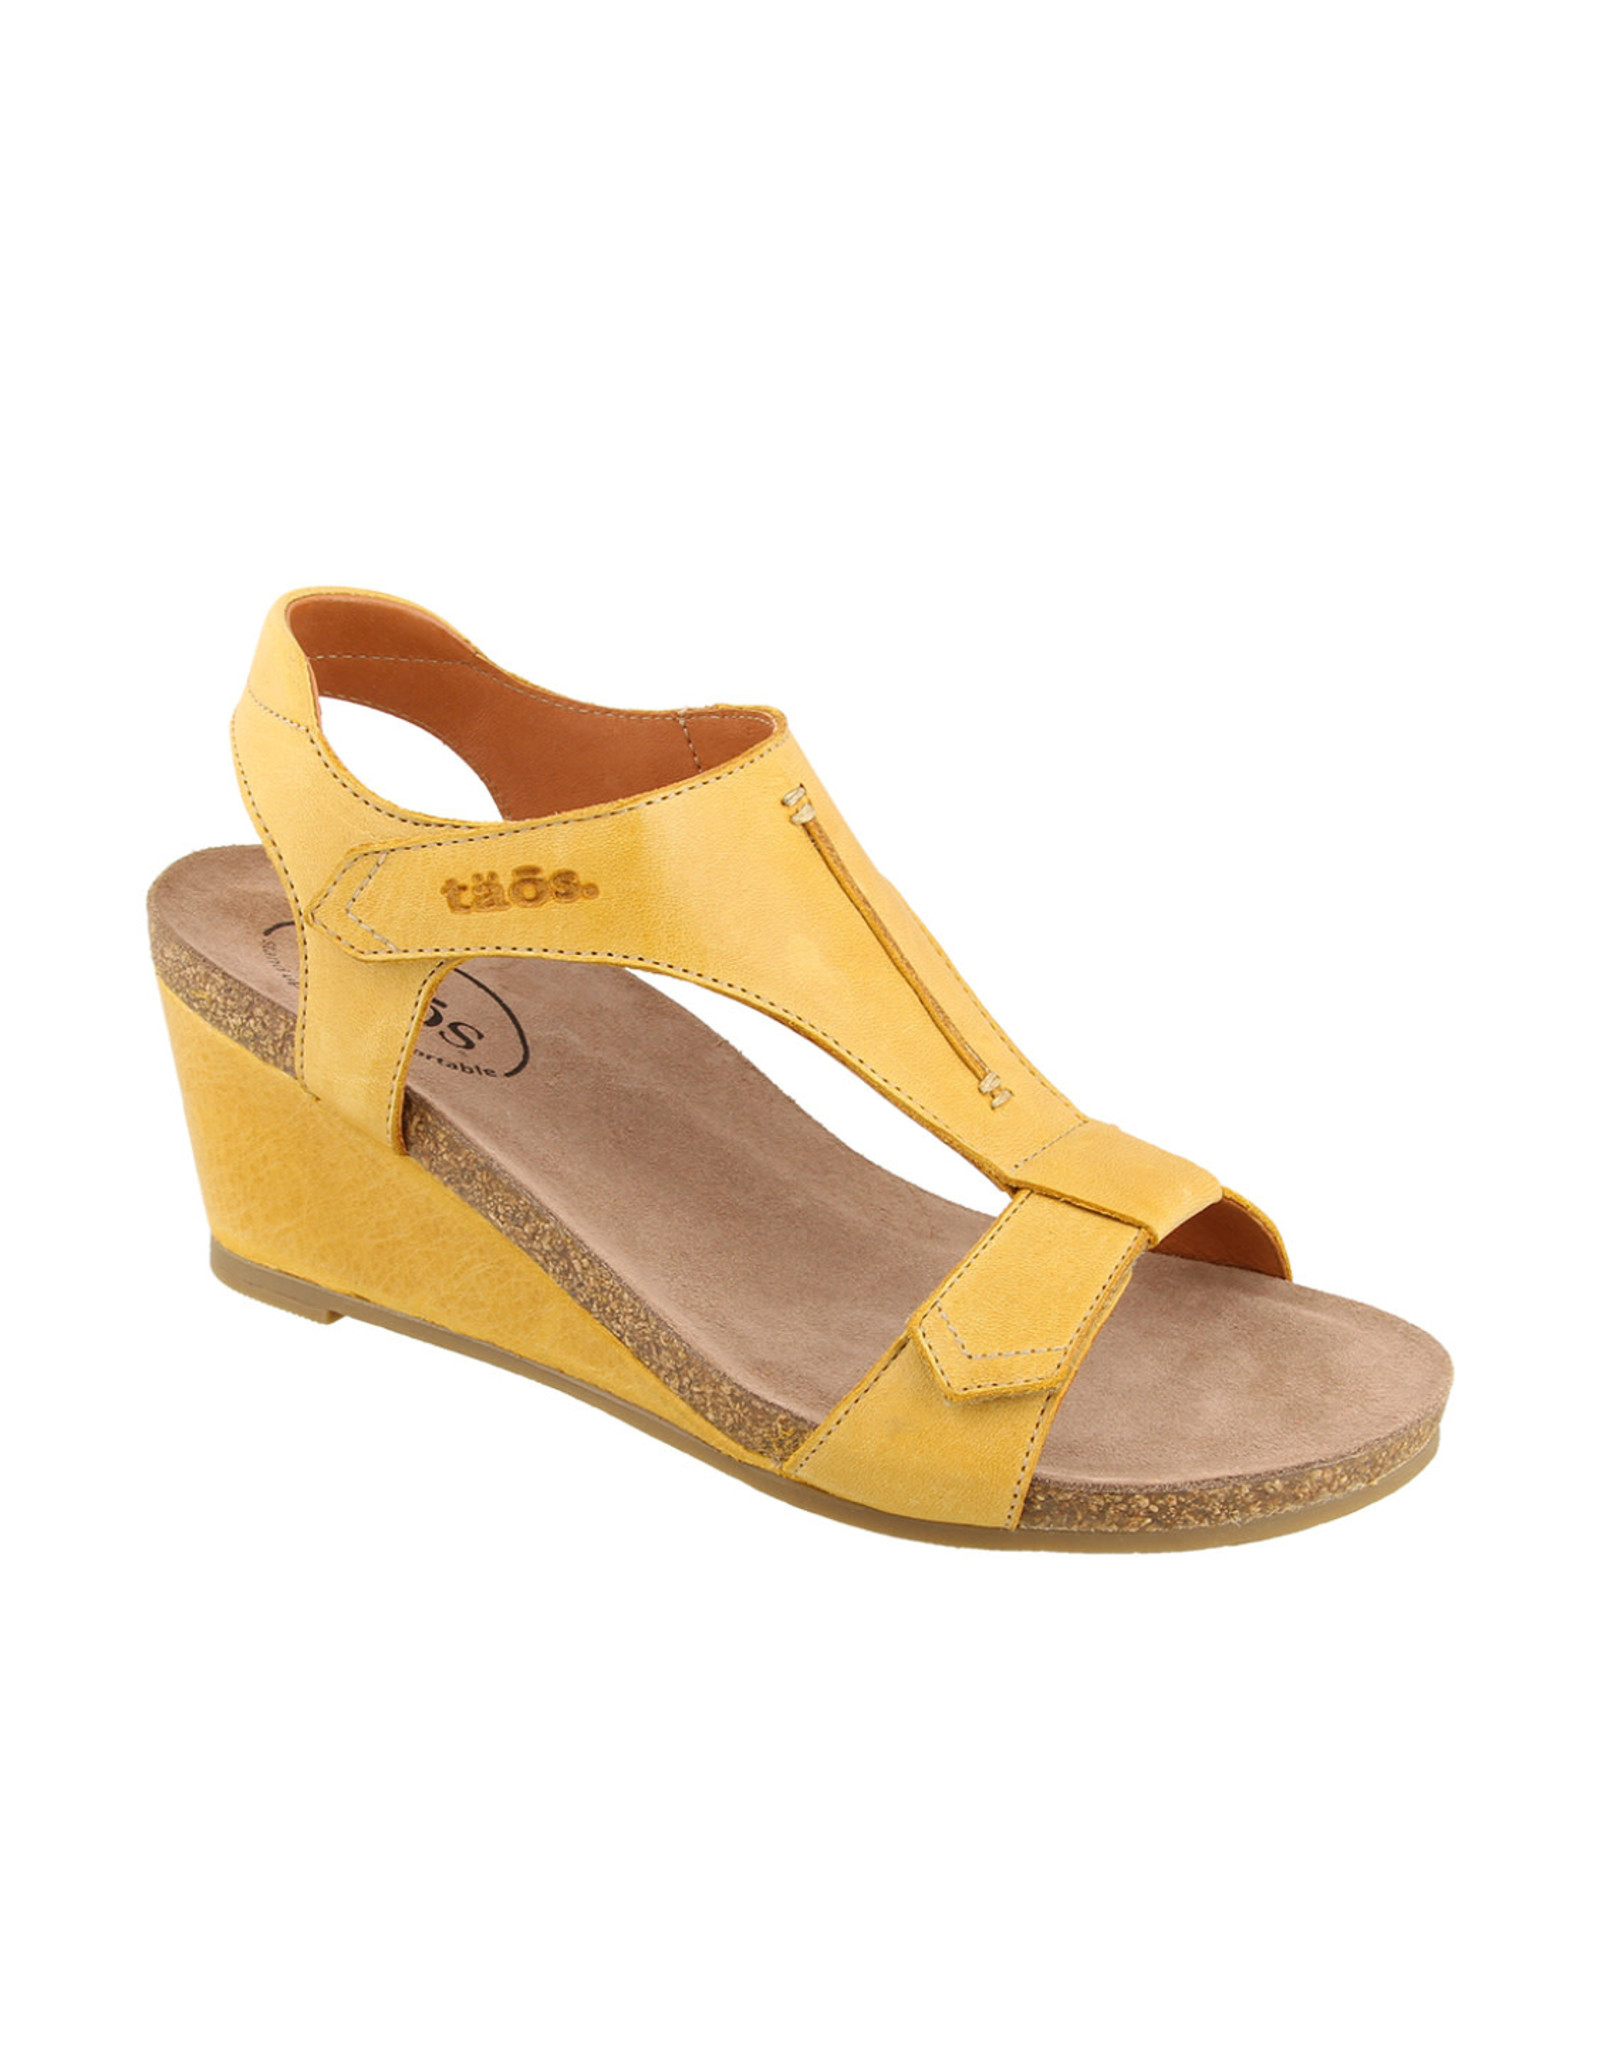 Taos Footwear Taos Sheila Leather Wedge Sandal